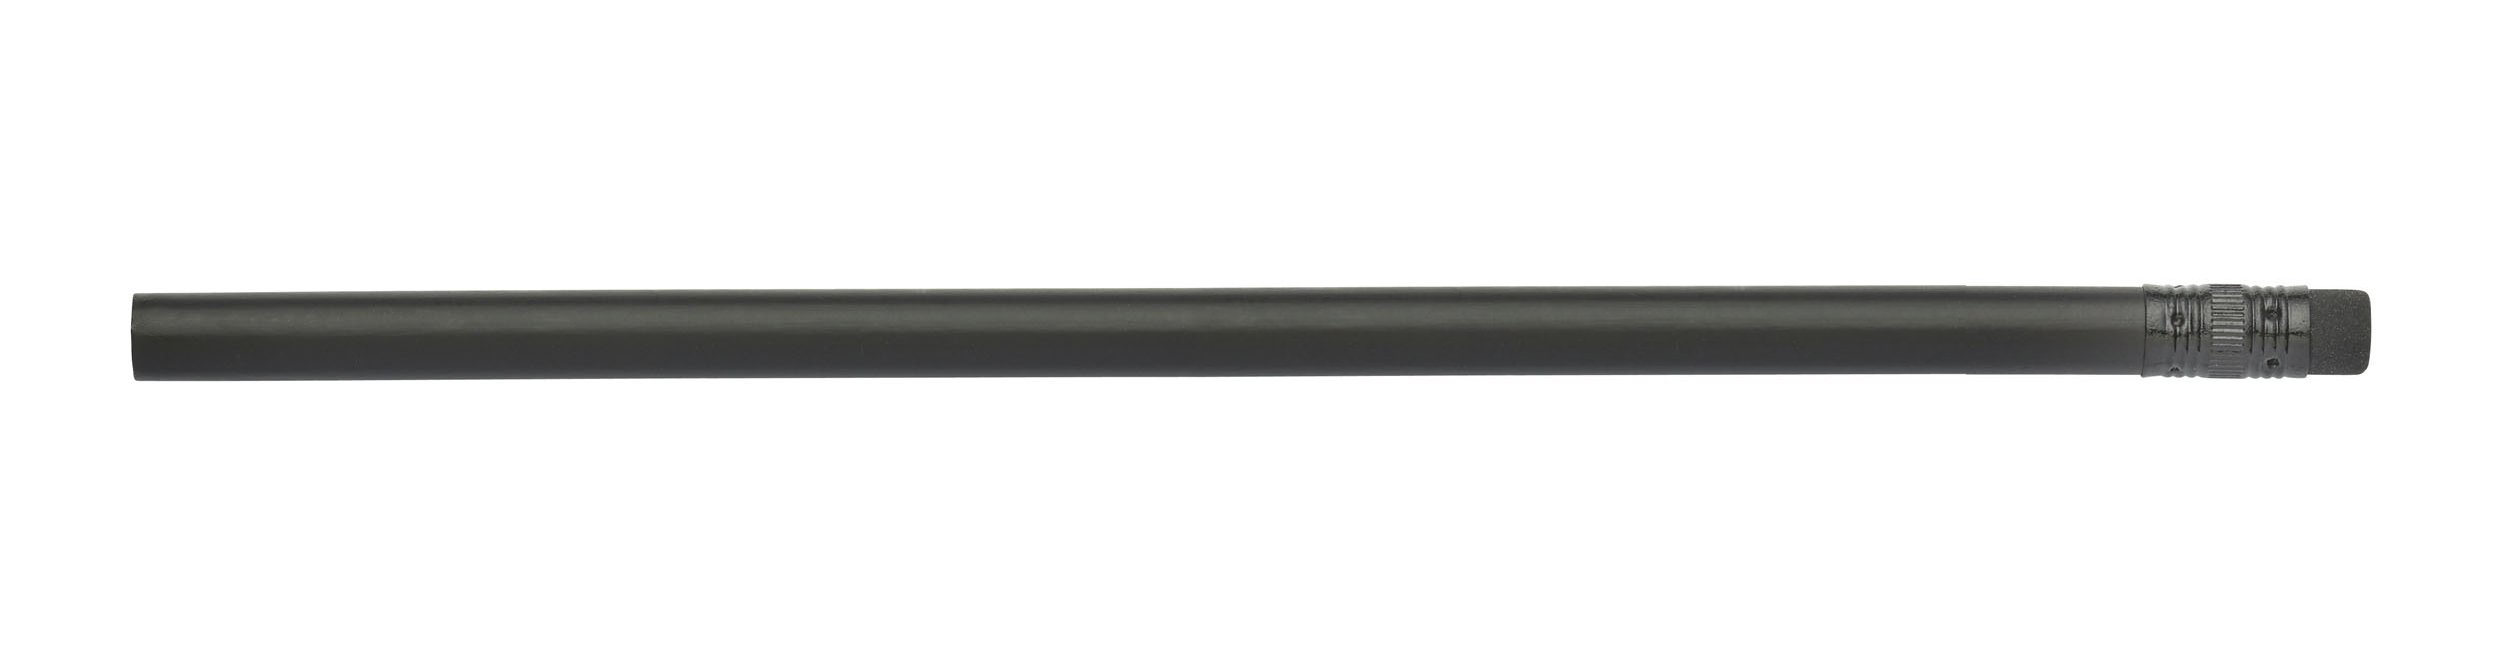 Pencil Guy Blank Black Matte Round Pencils Black Matte 144 to a Box